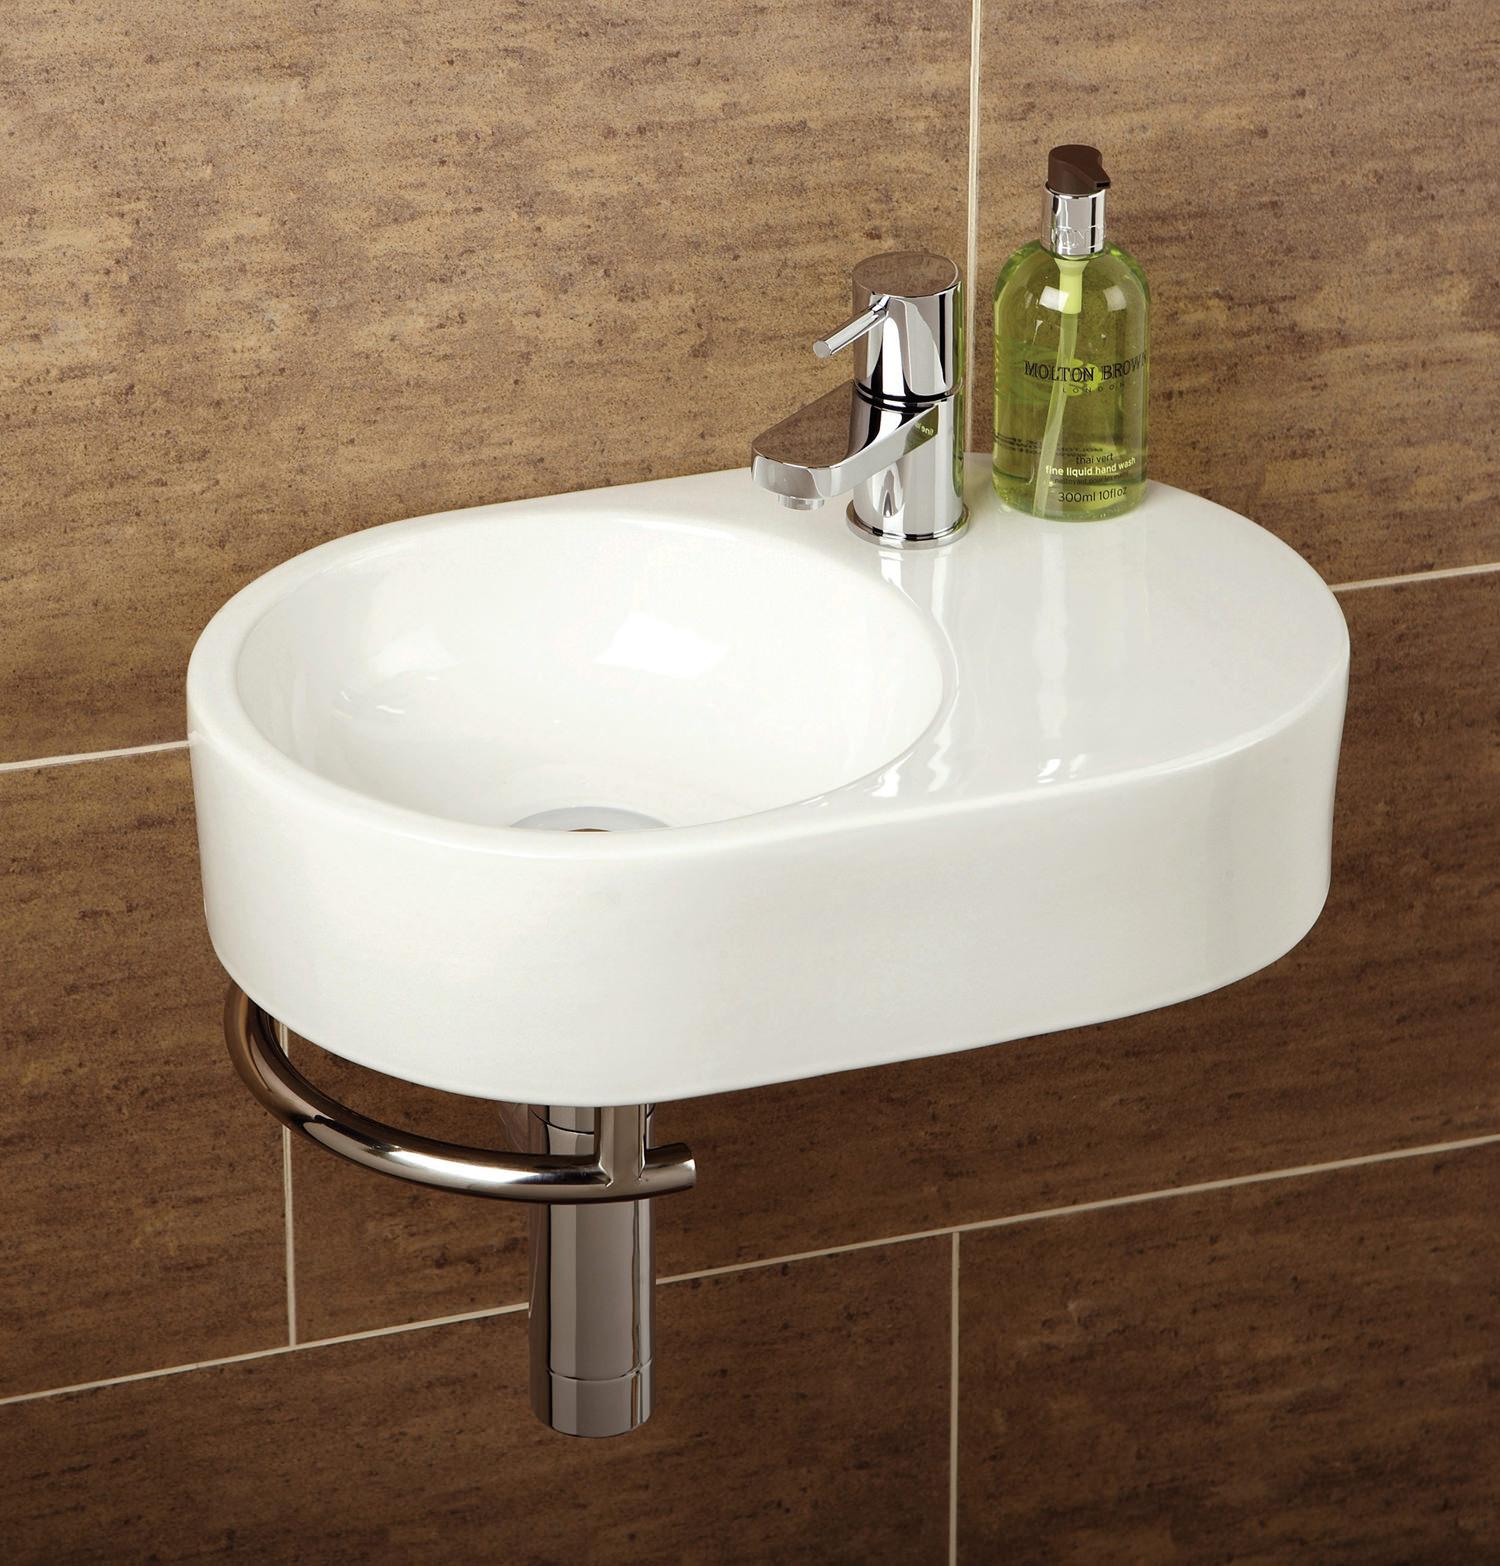 ... cloakroom basins hib malo saville cloakroom basin with towel rail